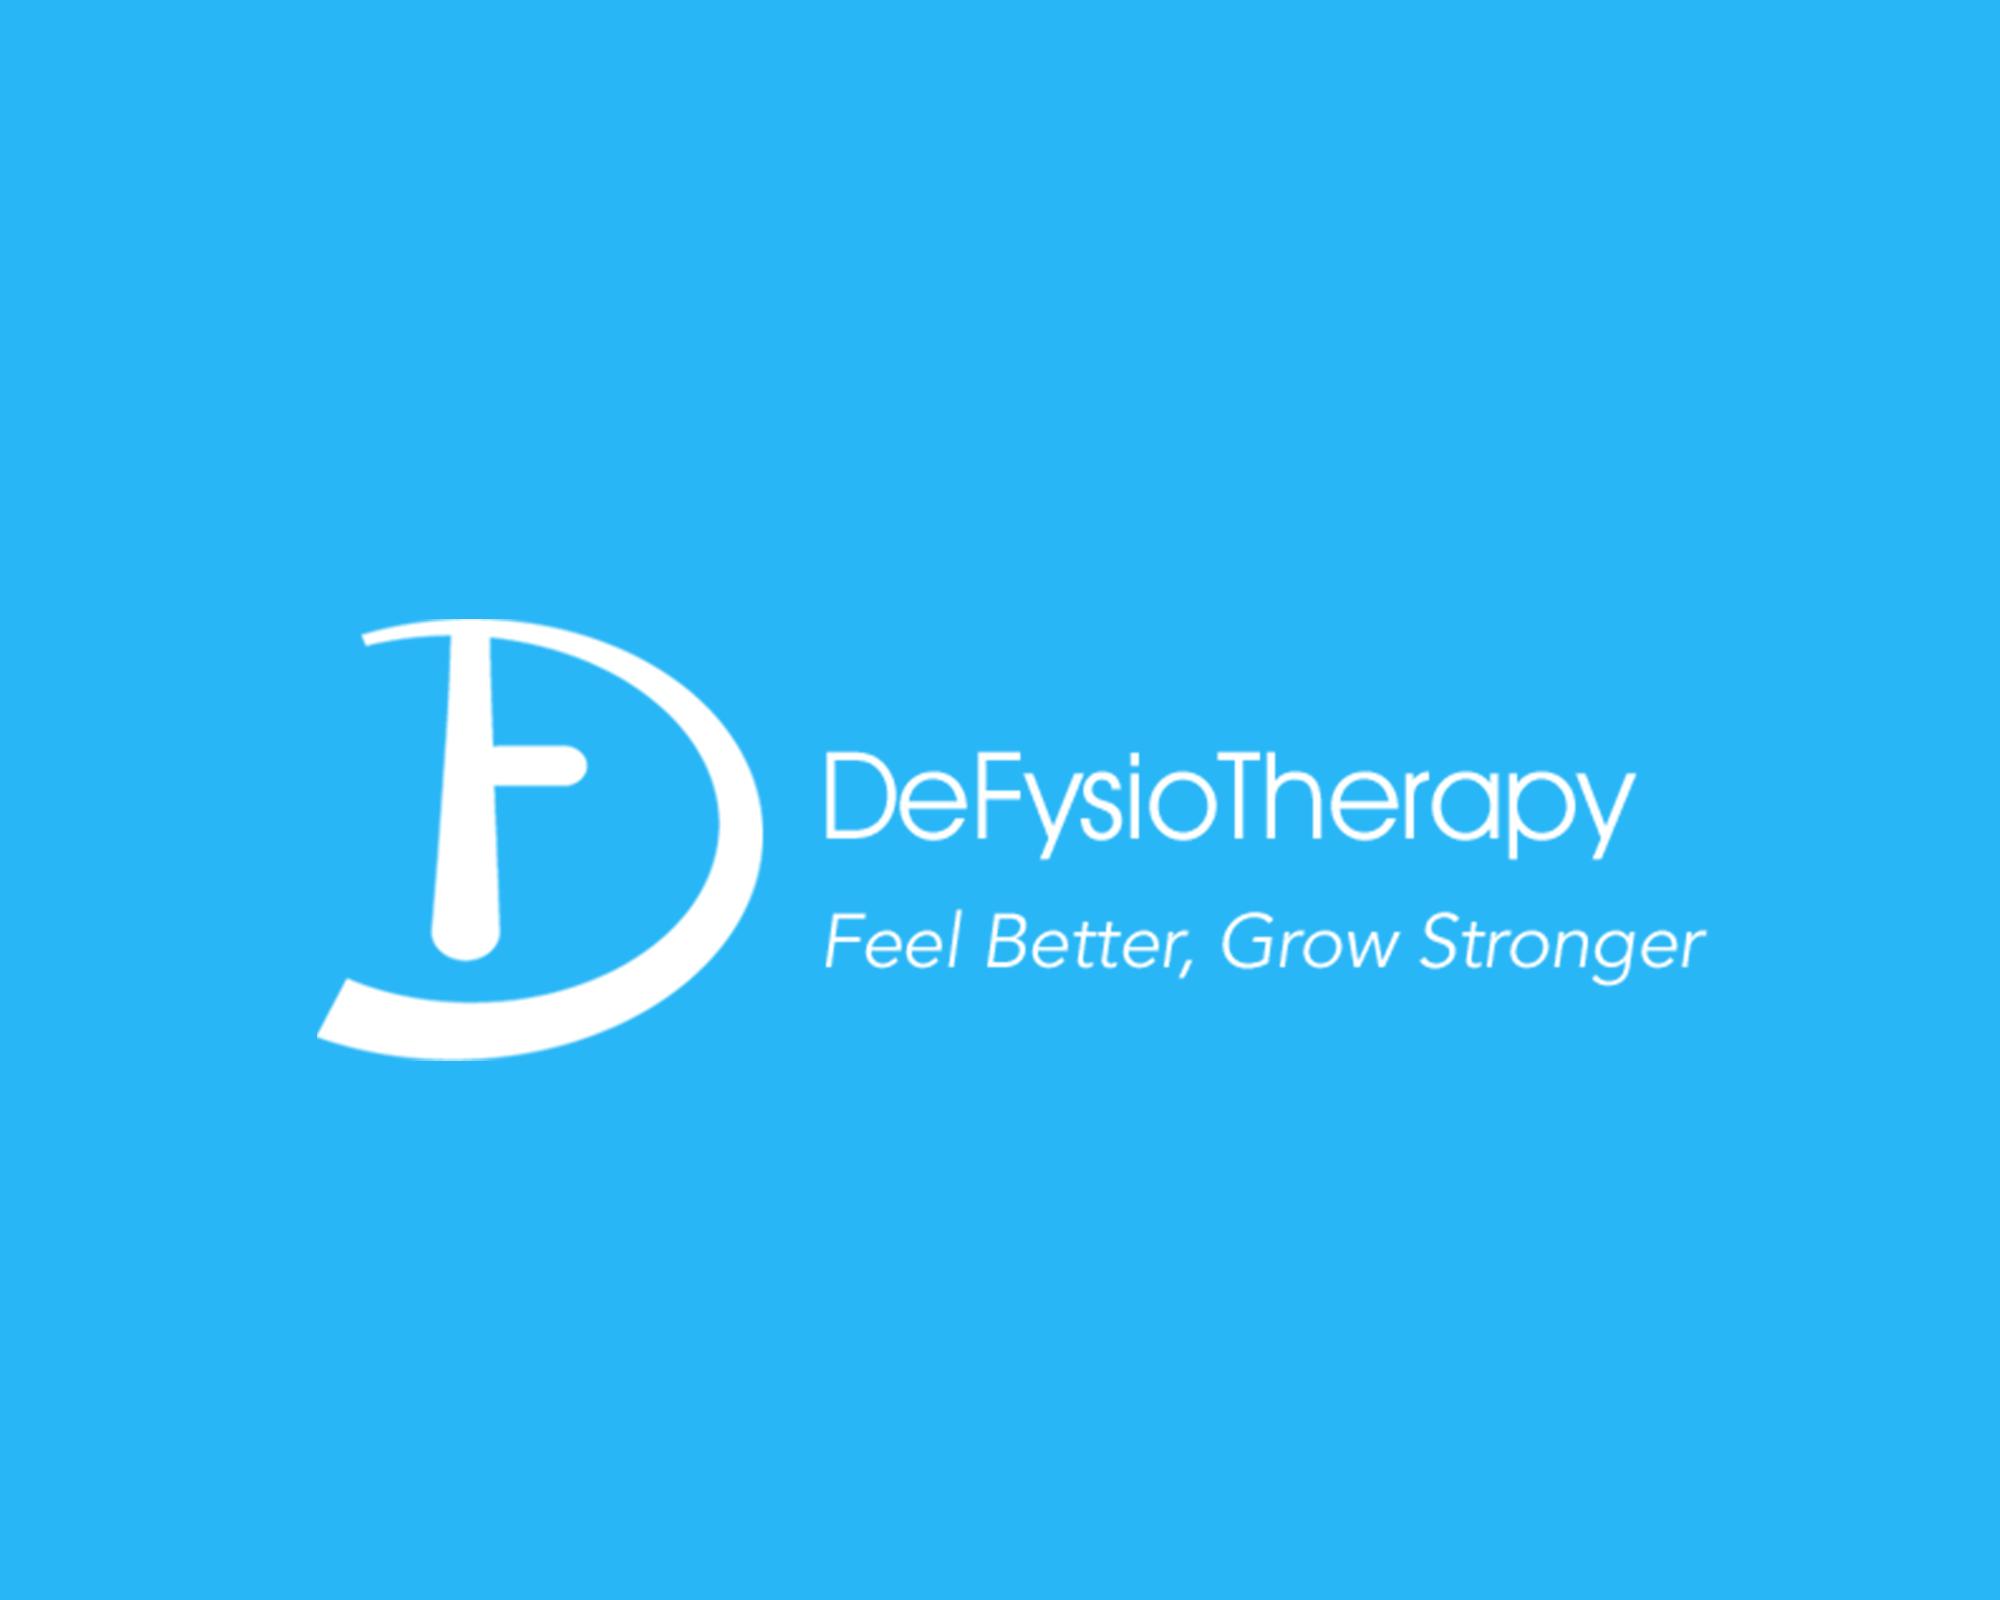 defysiotherapy Logo